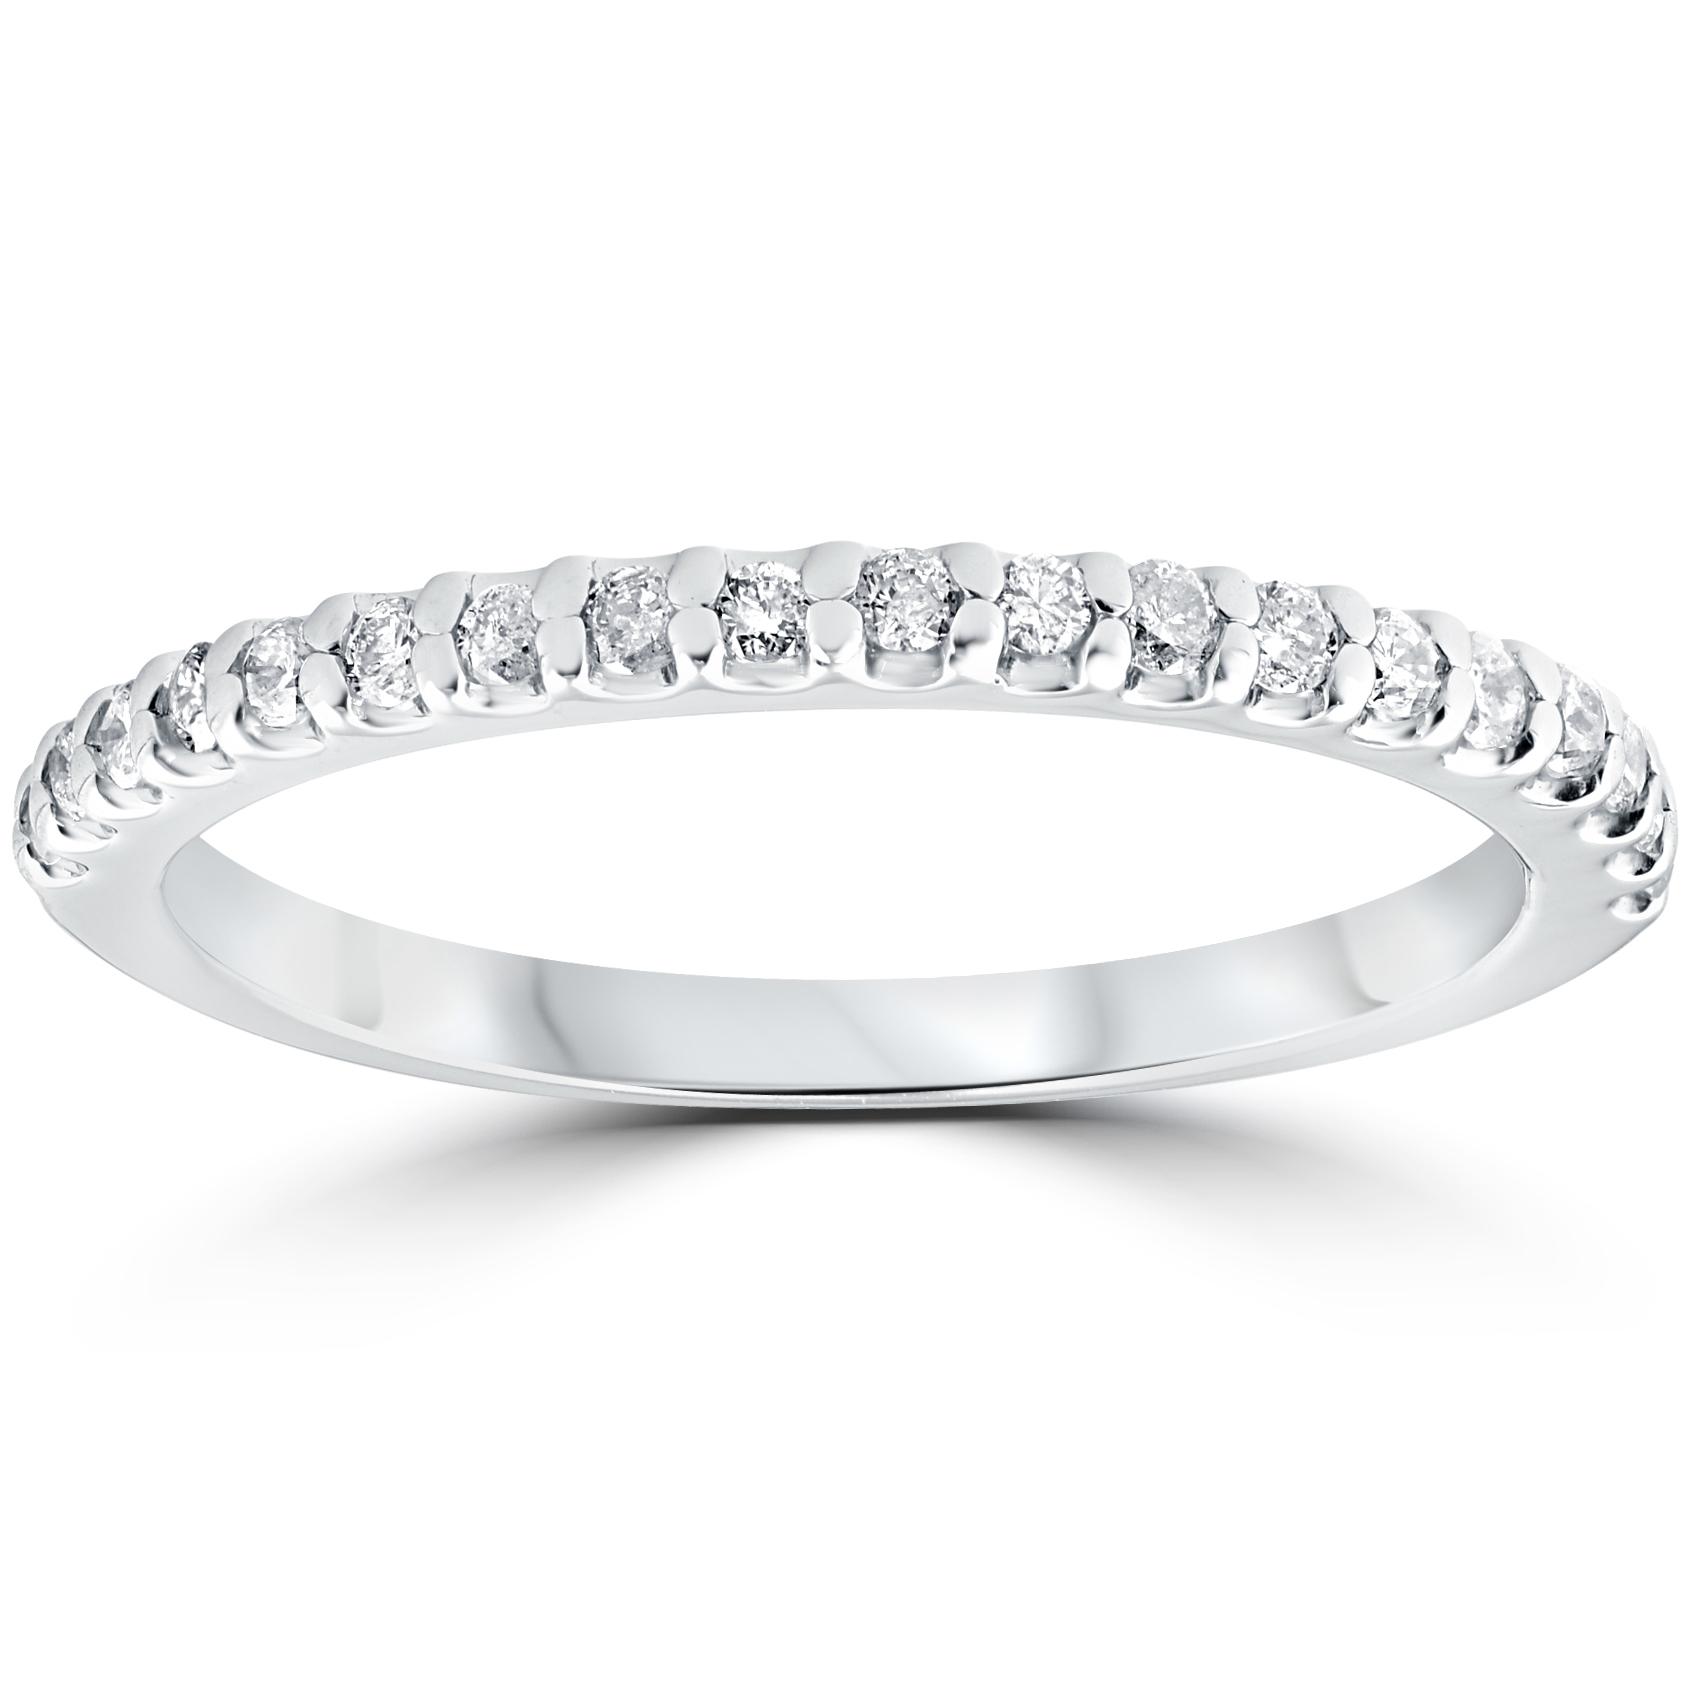 1/5 cttw Diamond Stackable Womens Wedding Ring 10k White